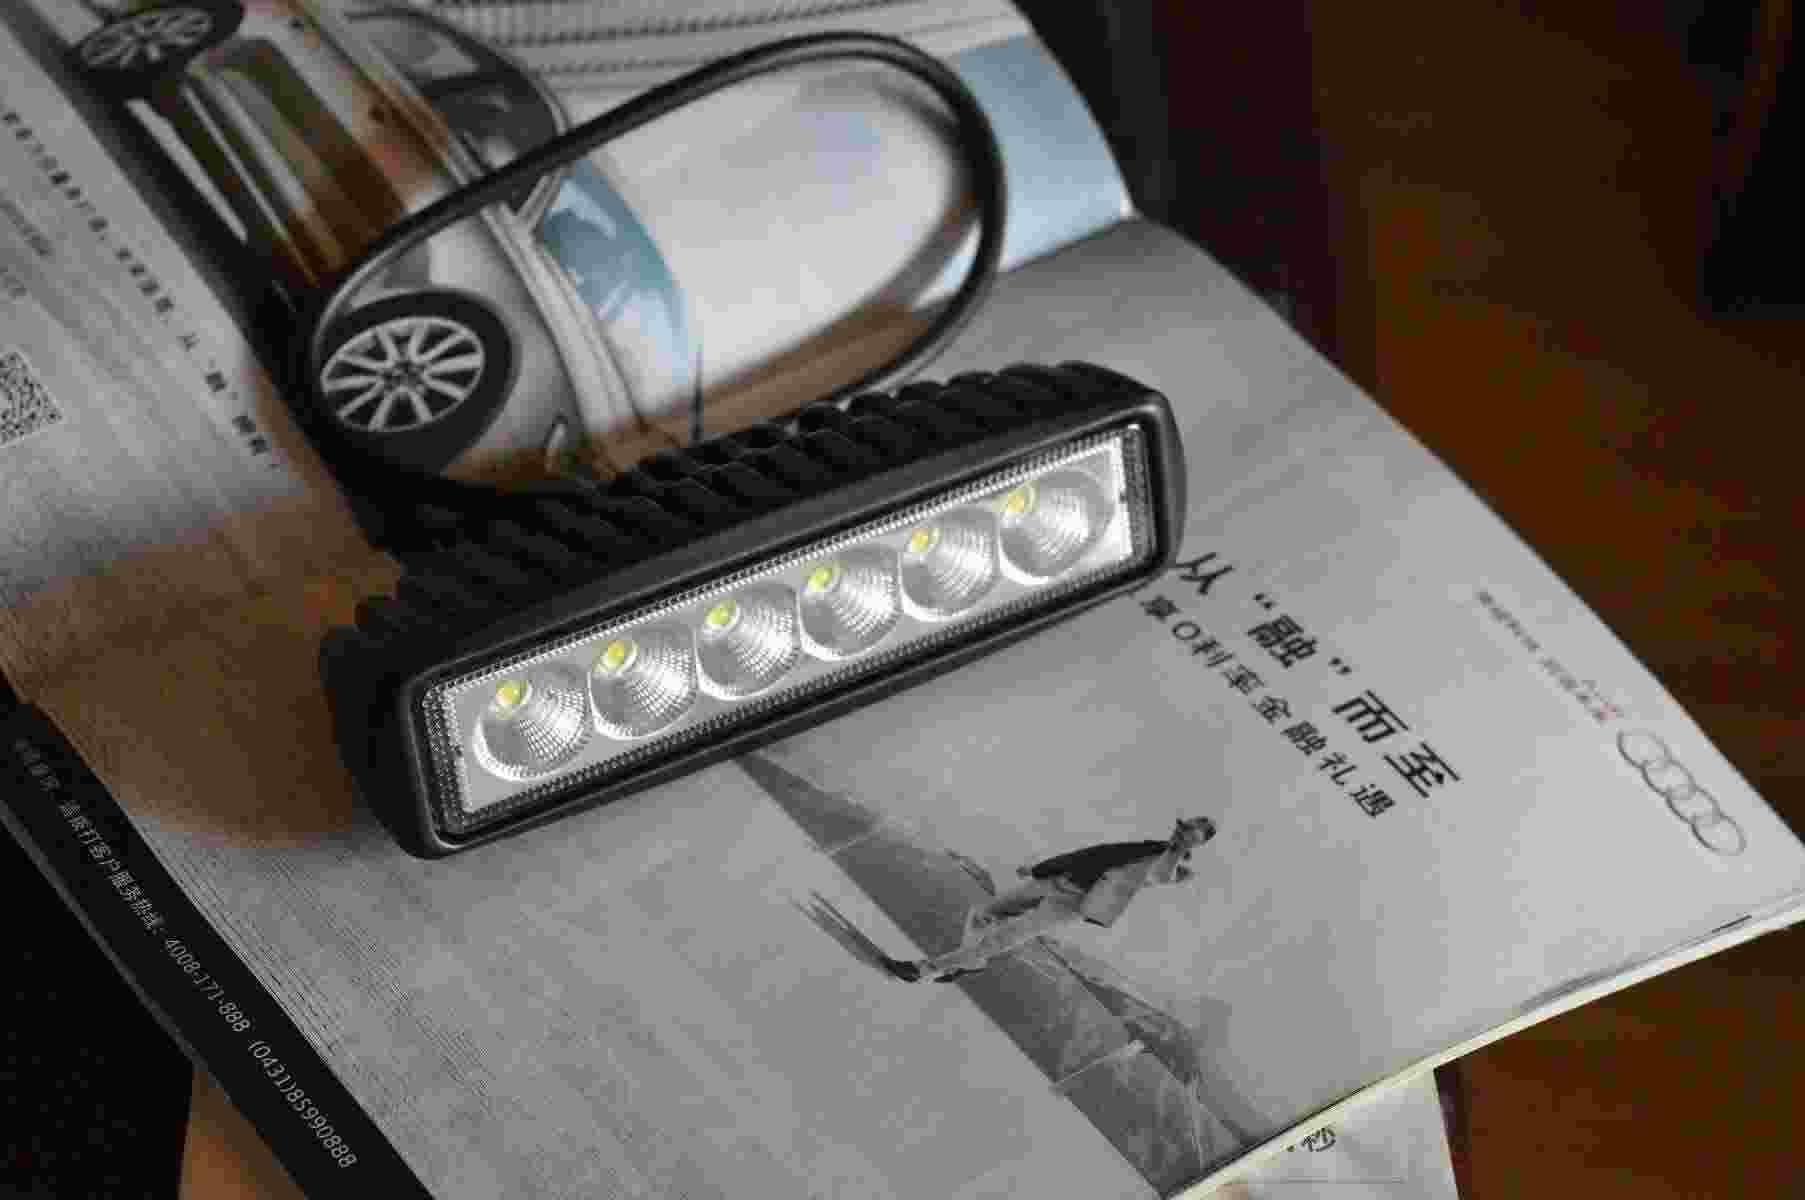 Hot Sale Led Flood Light Led Work Light 12v Led Cree Bar Marine Light 18w White Color Car Light 12v Dc Motorcycle Light Led Work Light Uk Led Work Lighting From Arjunxu